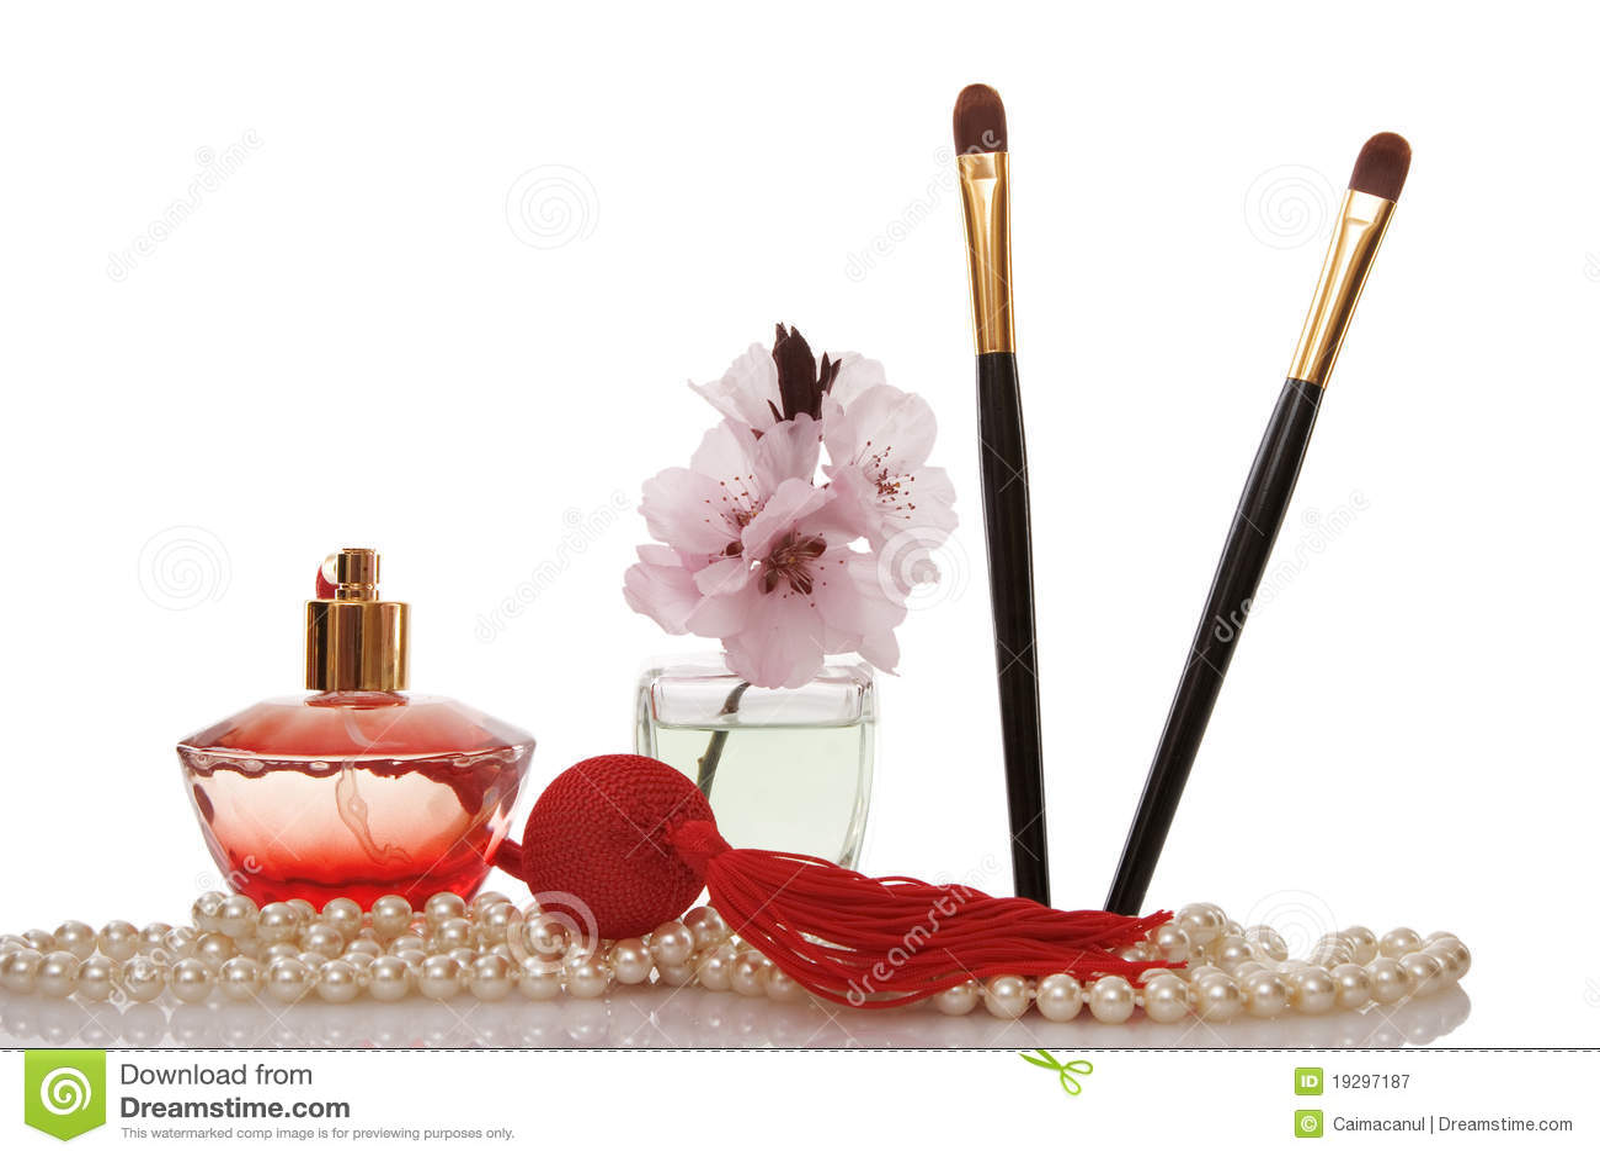 De parels van parels, parfum, twee schoonheidsmiddelenborstel